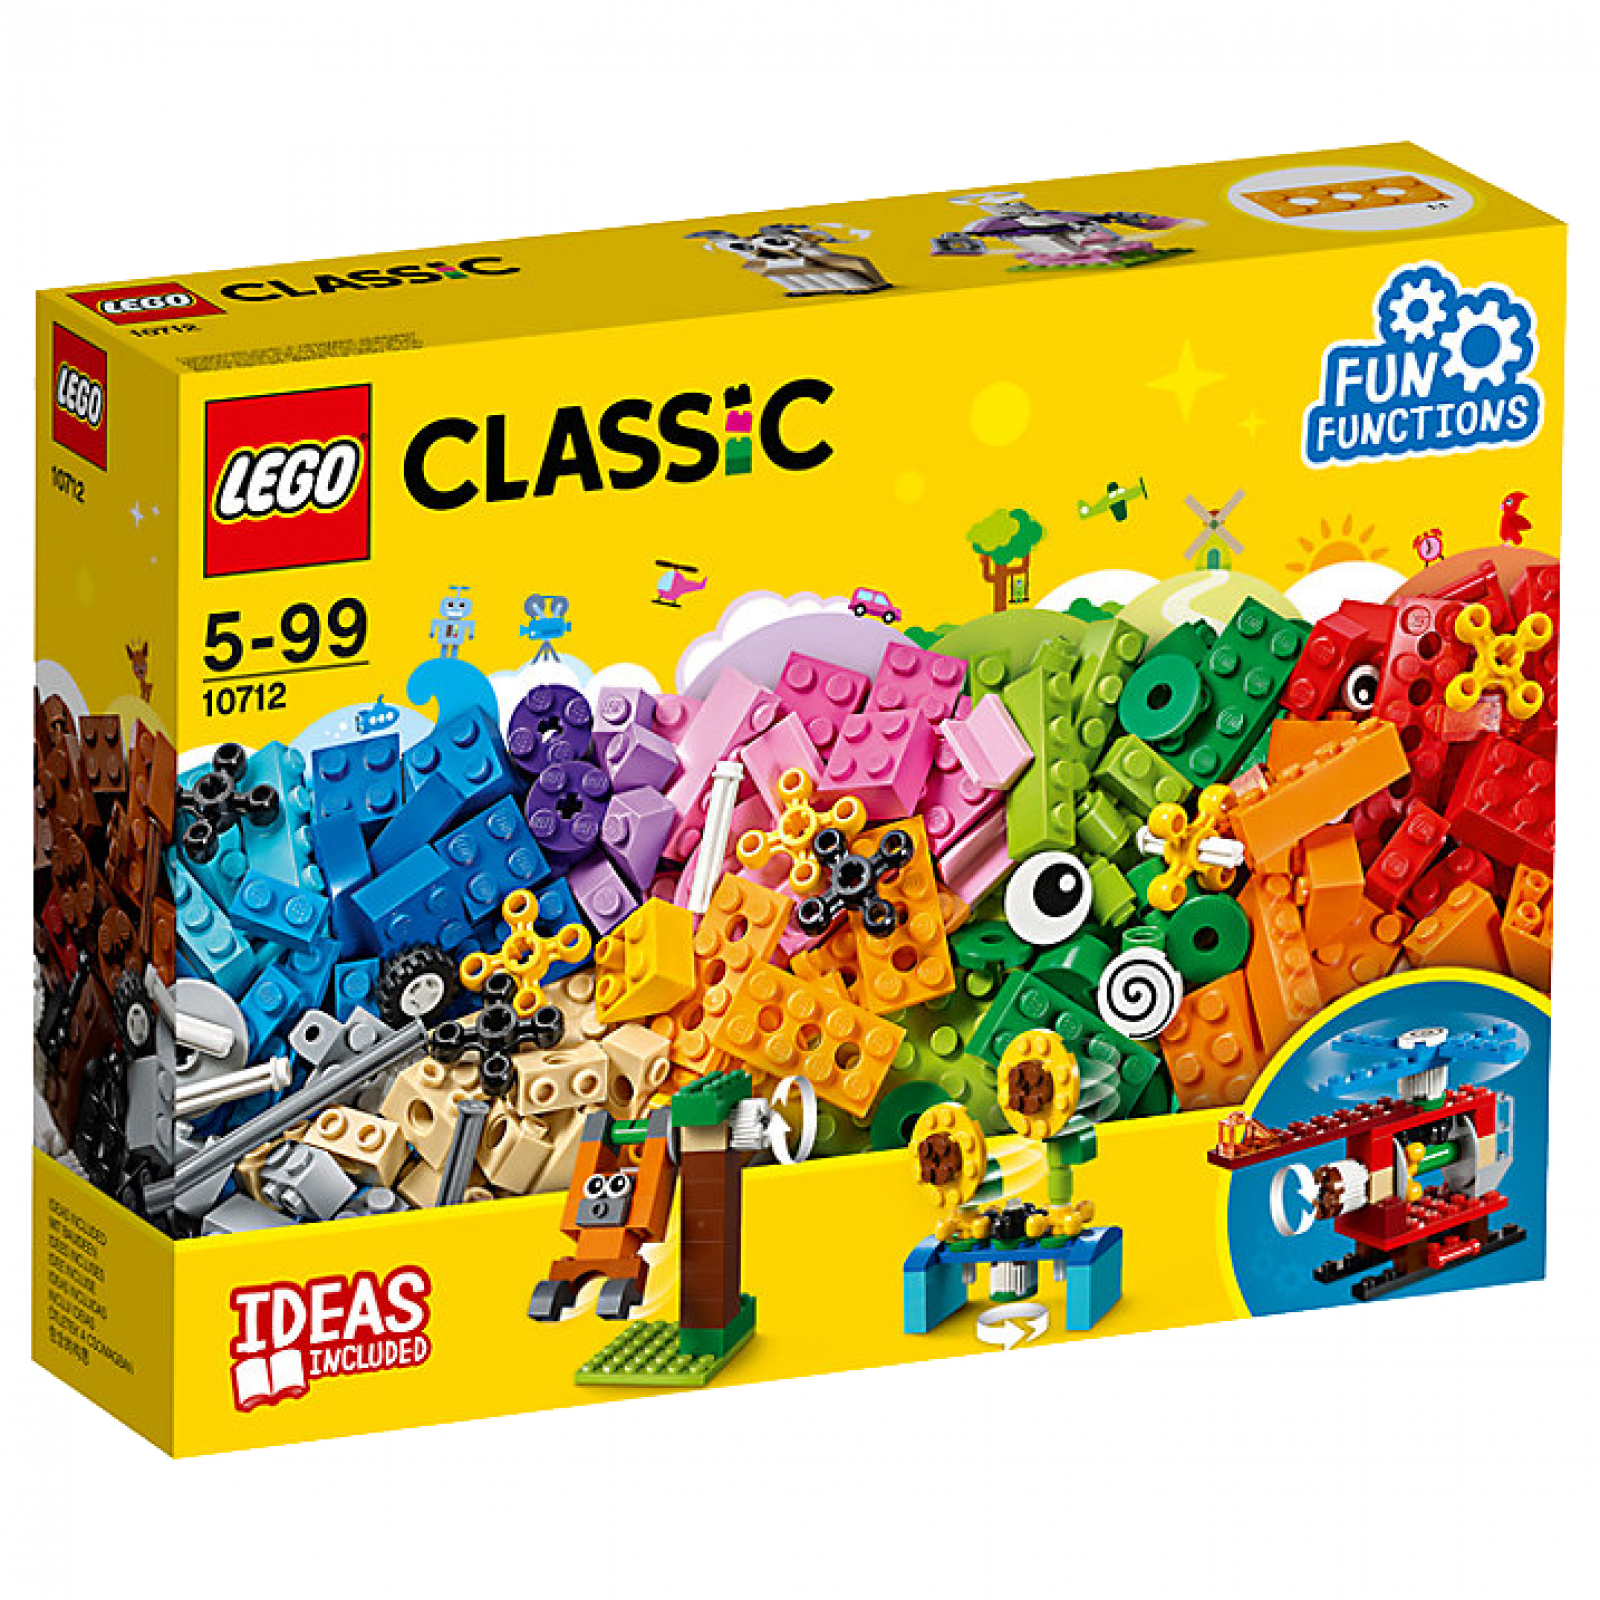 LEGO® Classic Bricks And Gears 10712 4+